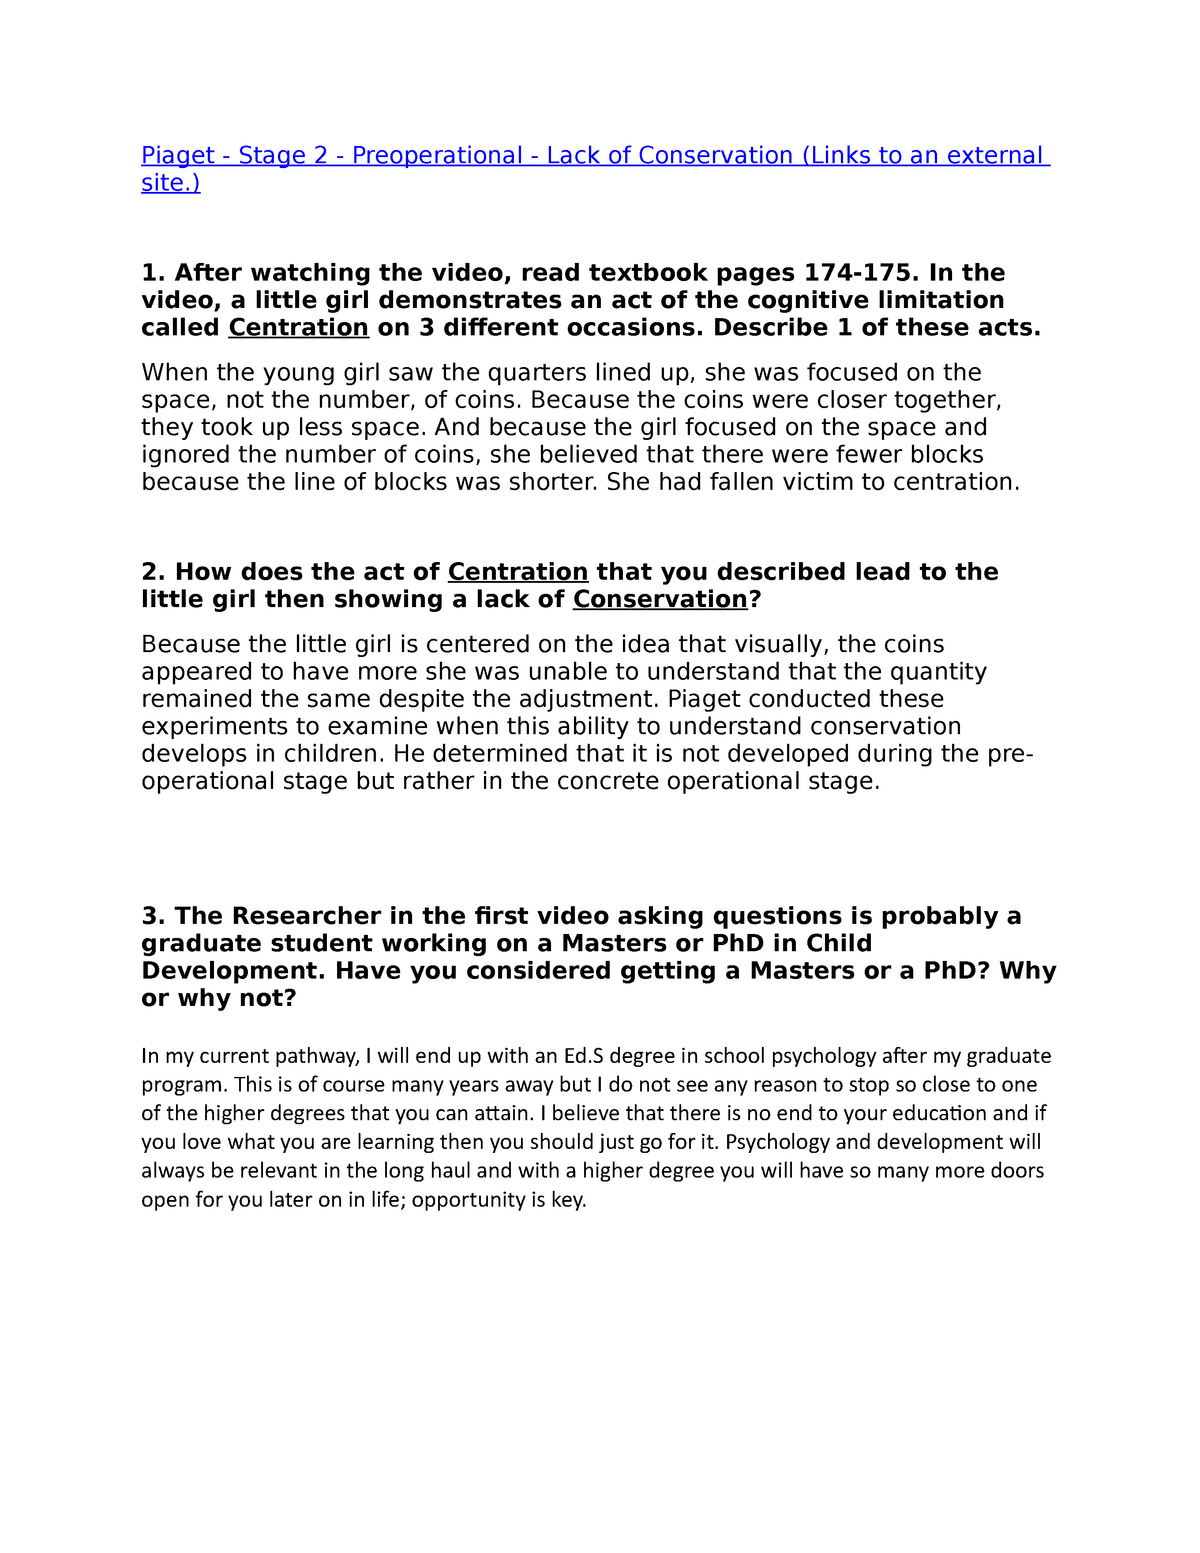 Ch 5 Discussion - PSYC200 Lifespan Psychology - StuDocu